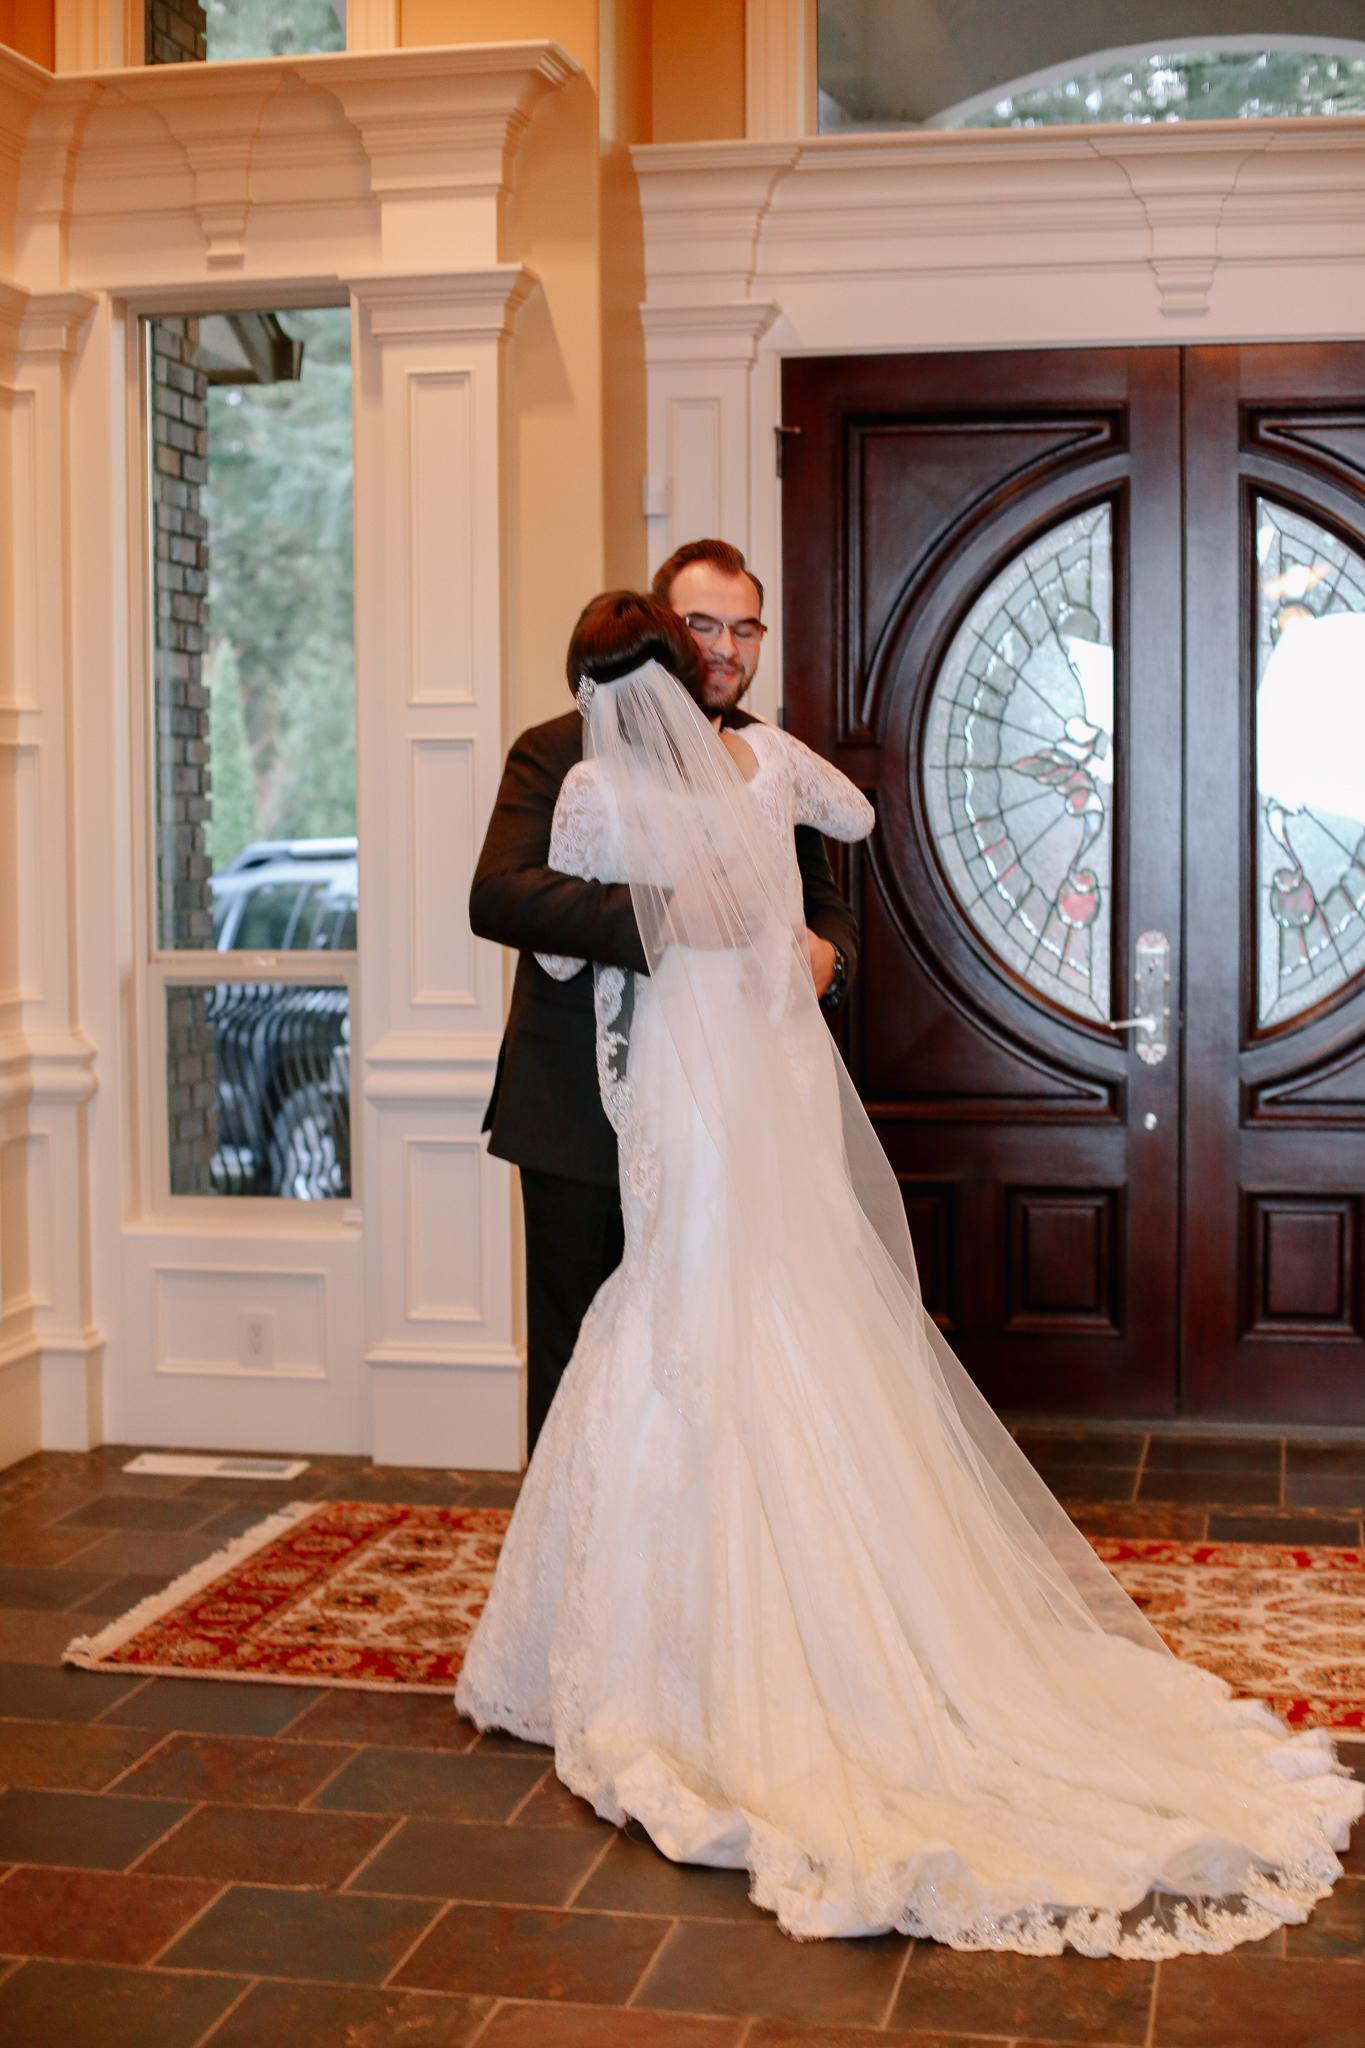 Manu and Laura - Portland Wedding Photographer - 21.jpg